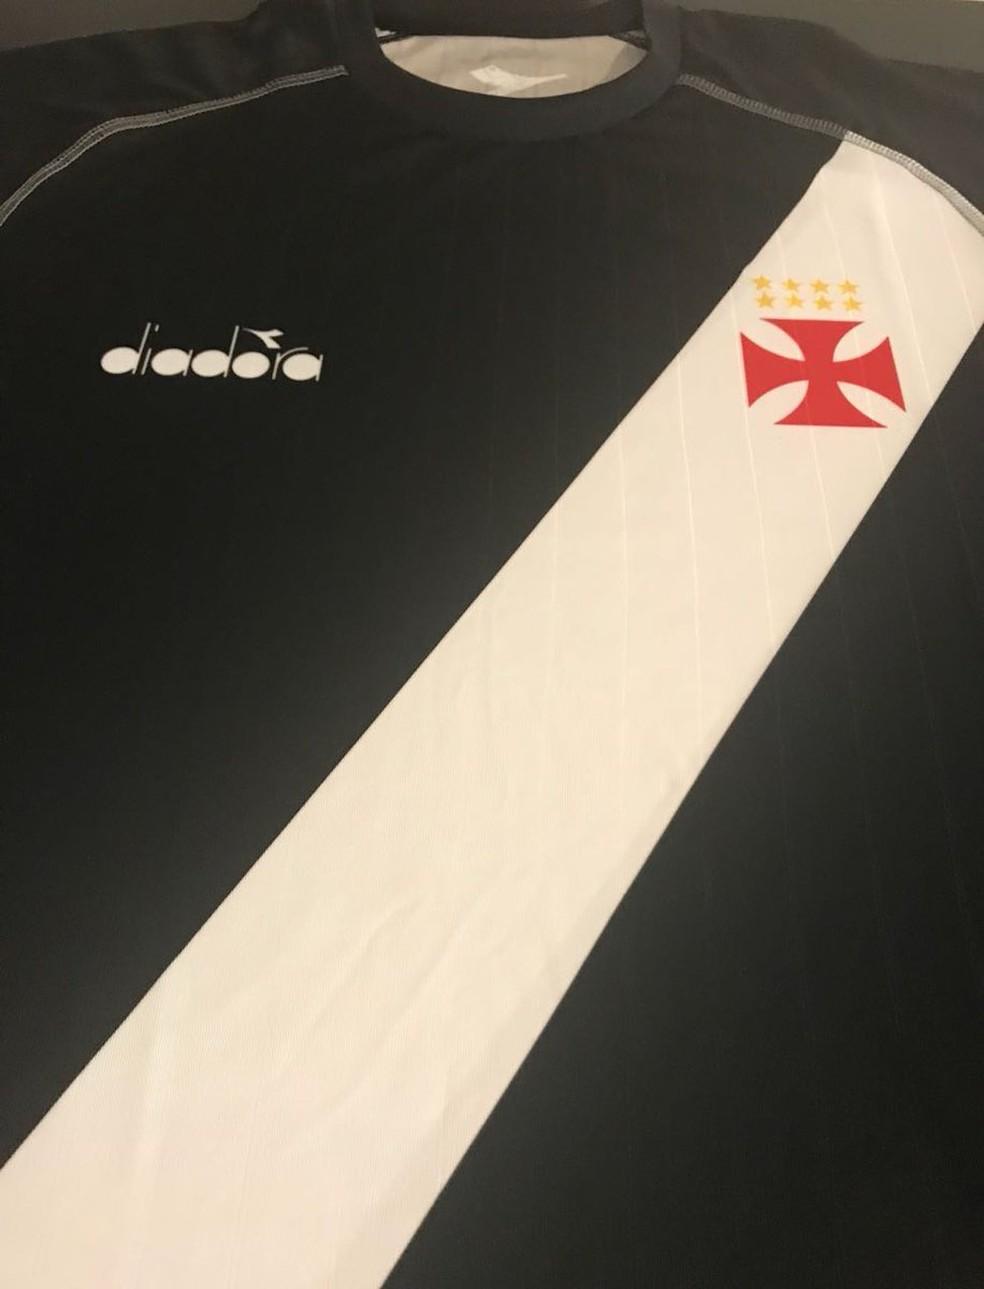 Confira o novo uniforme